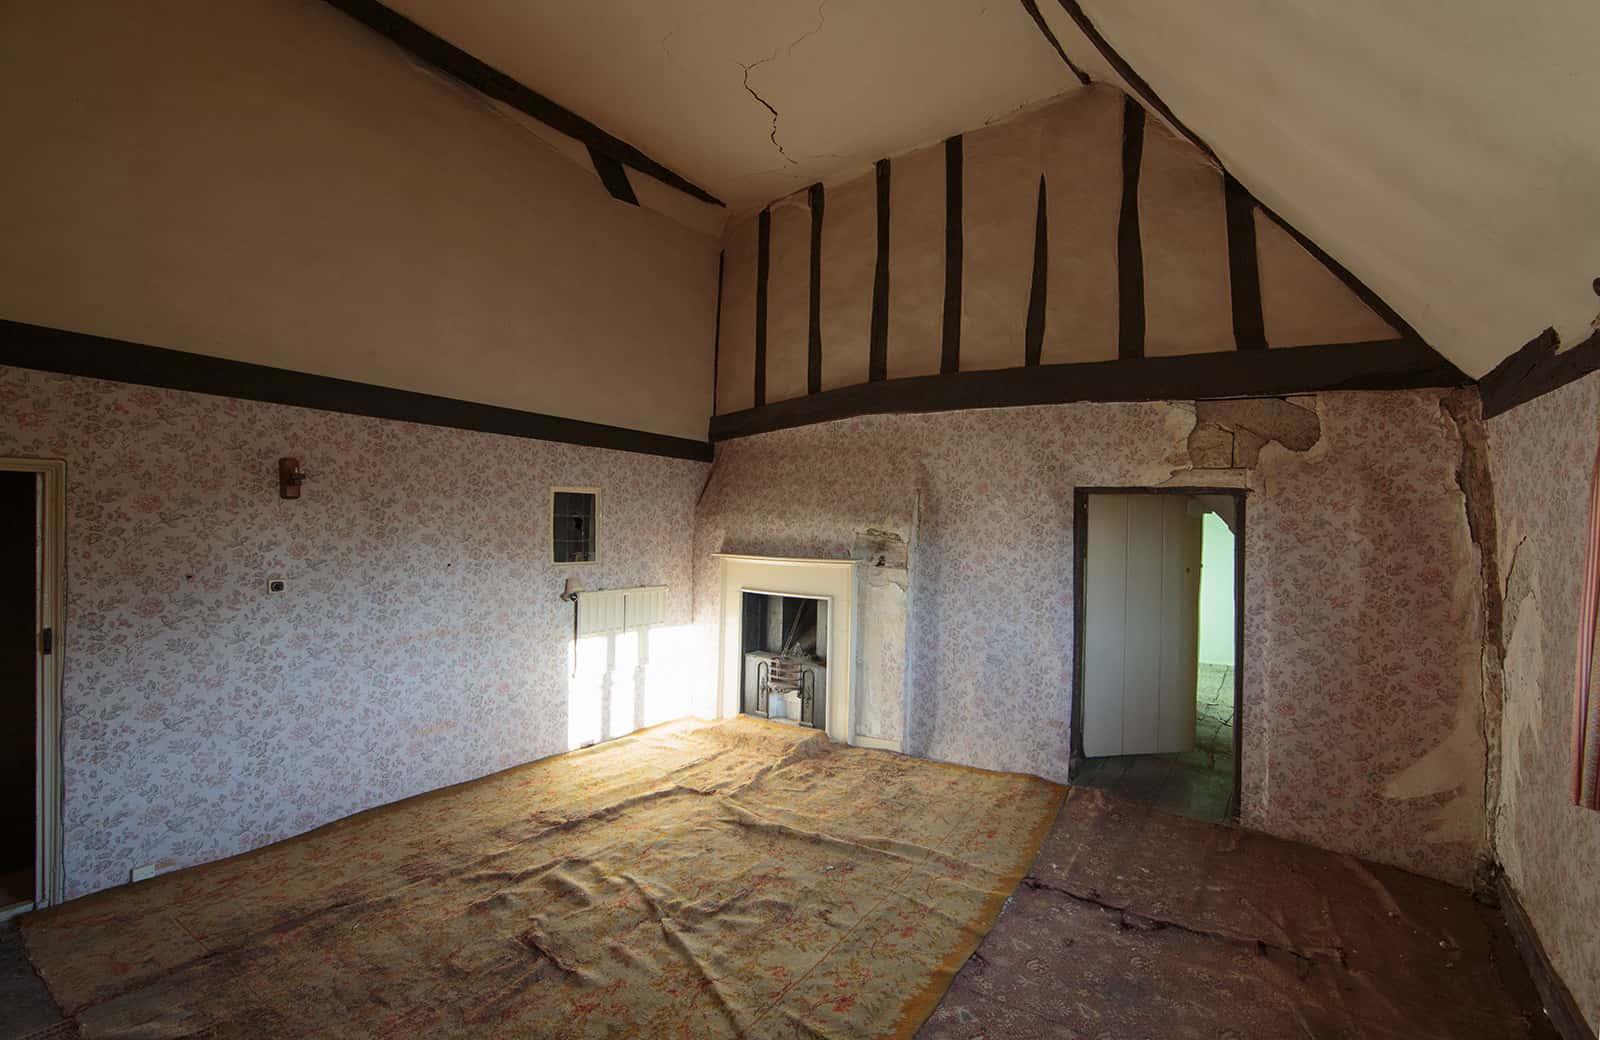 Bedroom in Manor Farm in Spaldwick